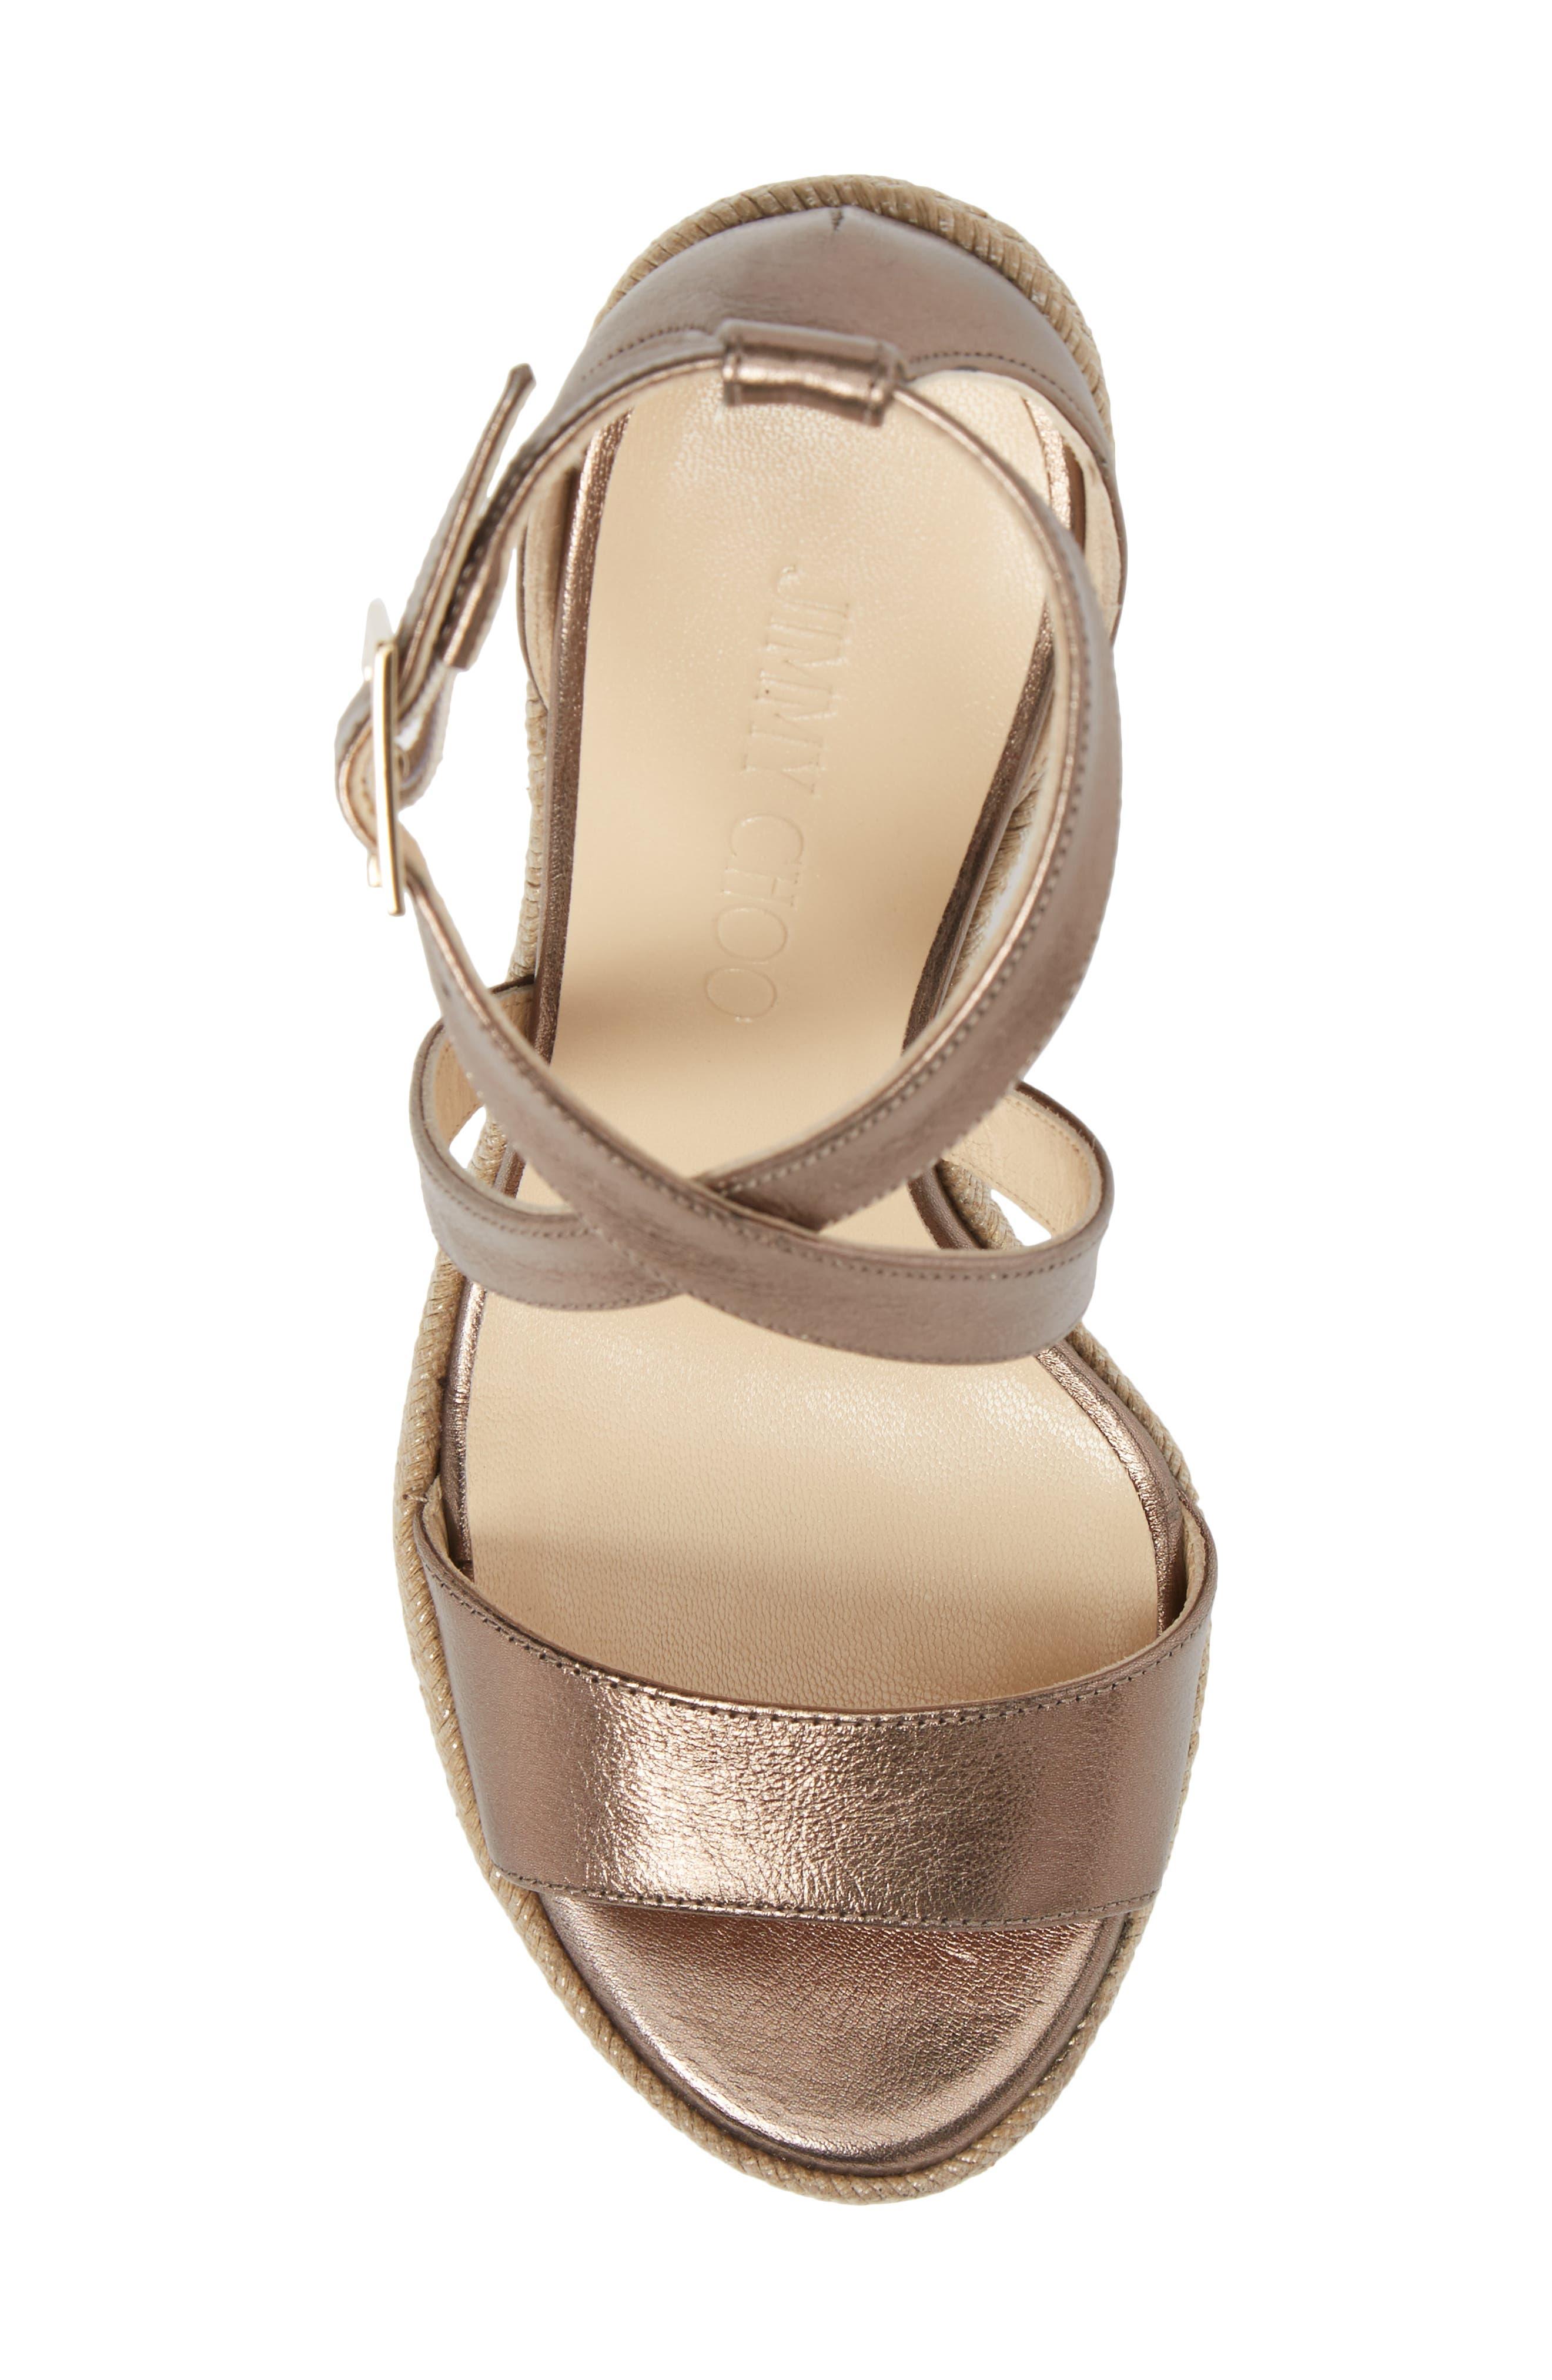 Portia Wedge Platform Sandal,                             Alternate thumbnail 5, color,                             Antique Gold